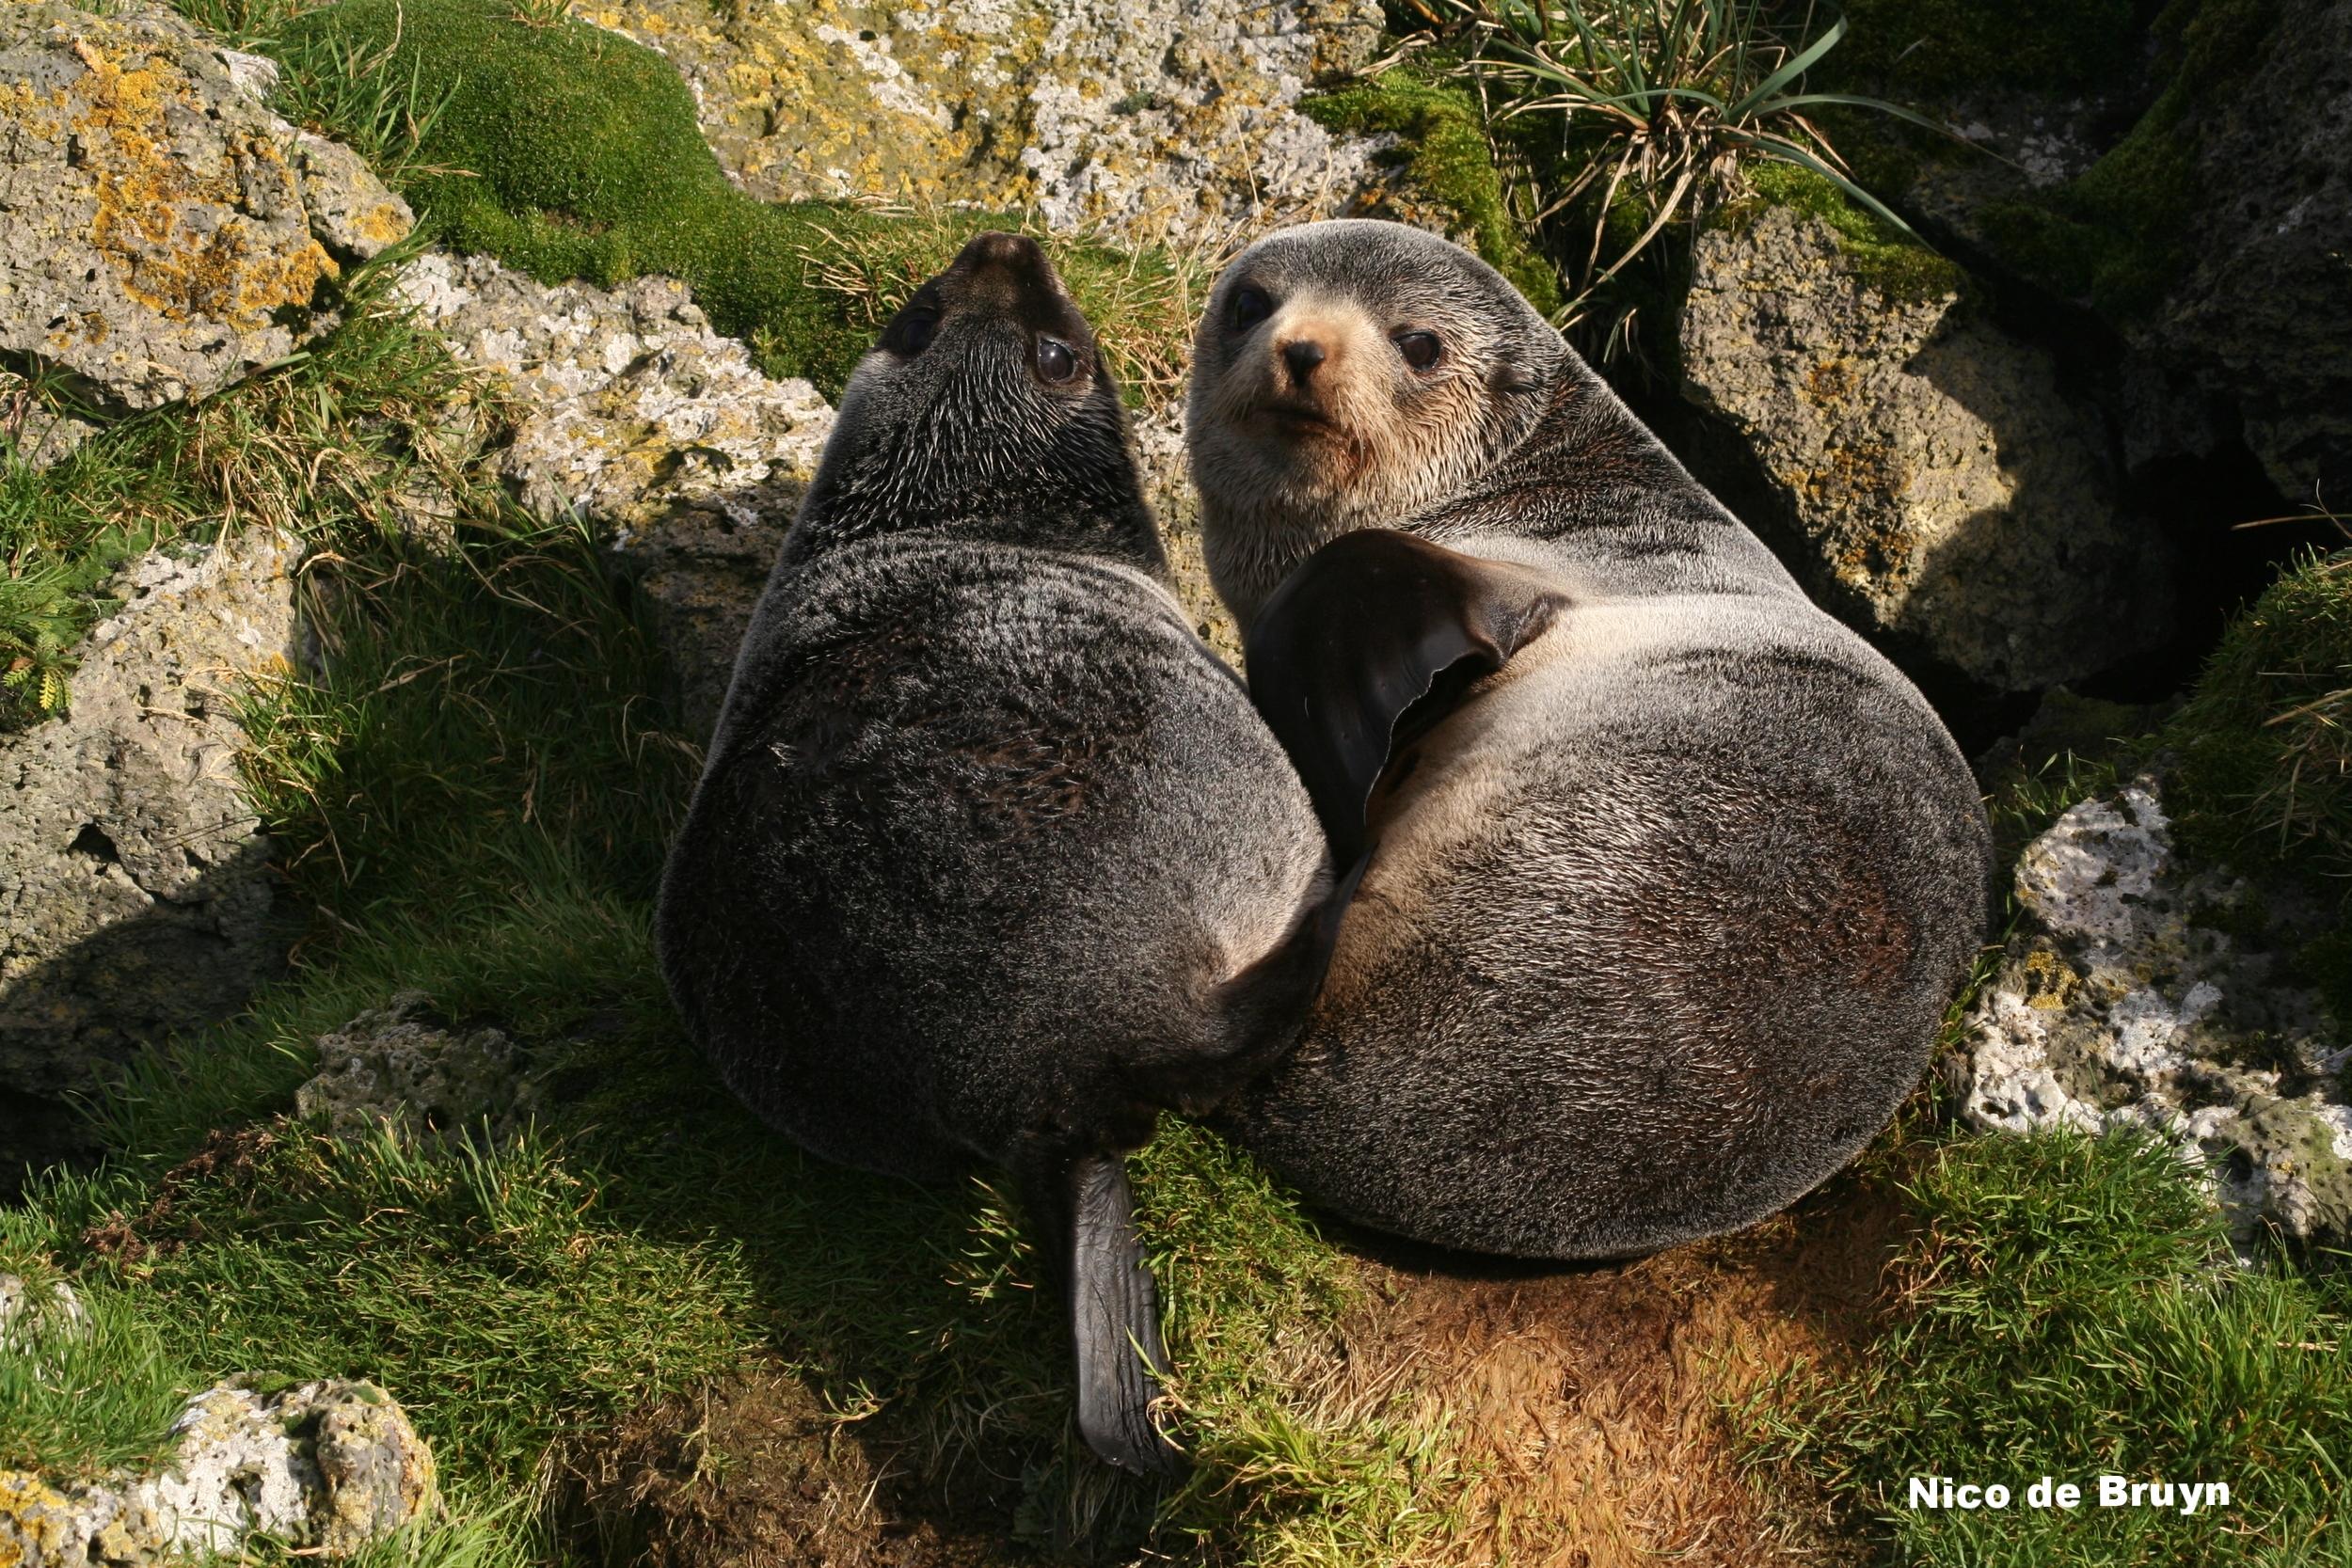 Subantarctic fur seal mother and pup. Photo: Nico de Bruyn